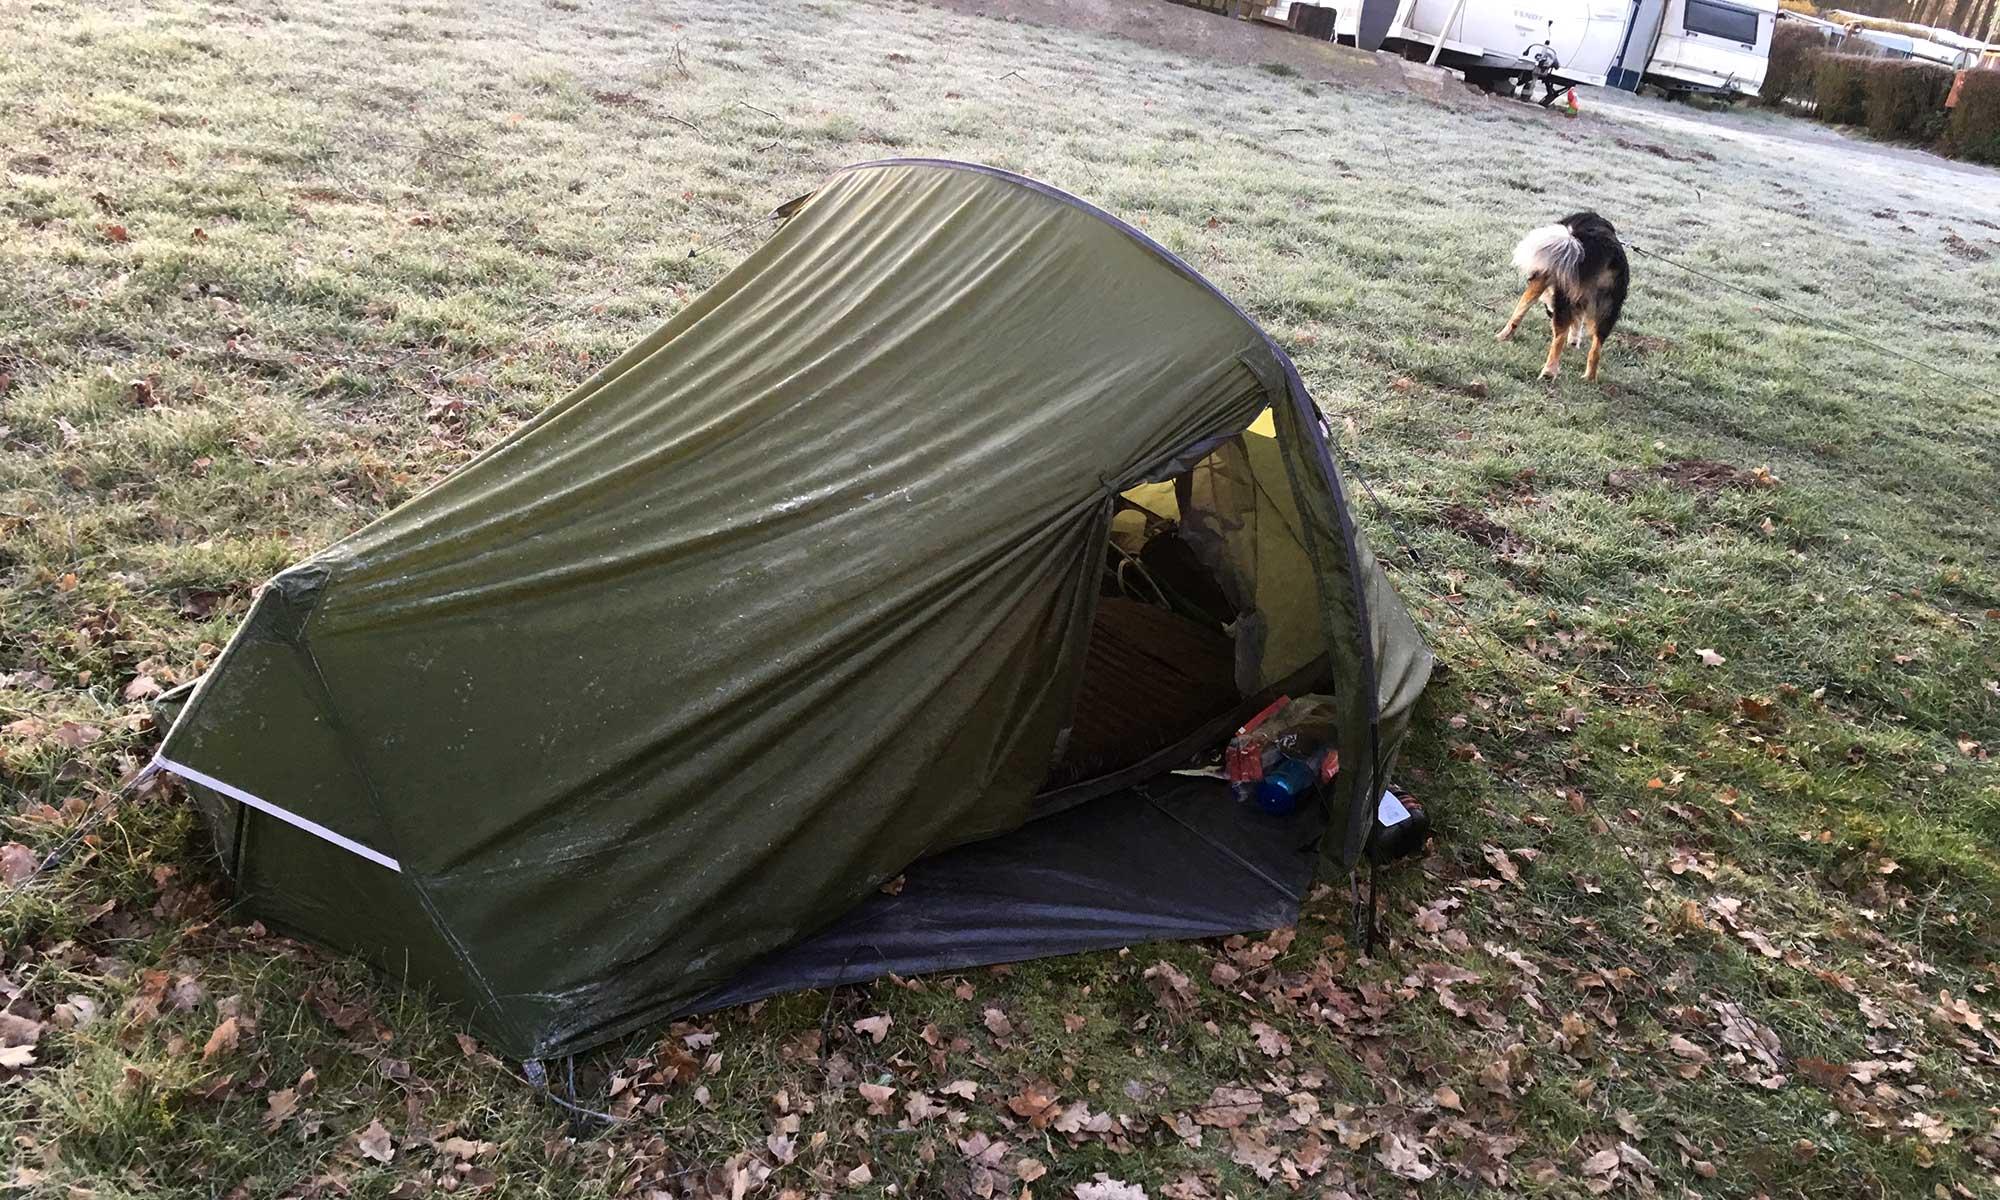 Mein vereistes Zelt